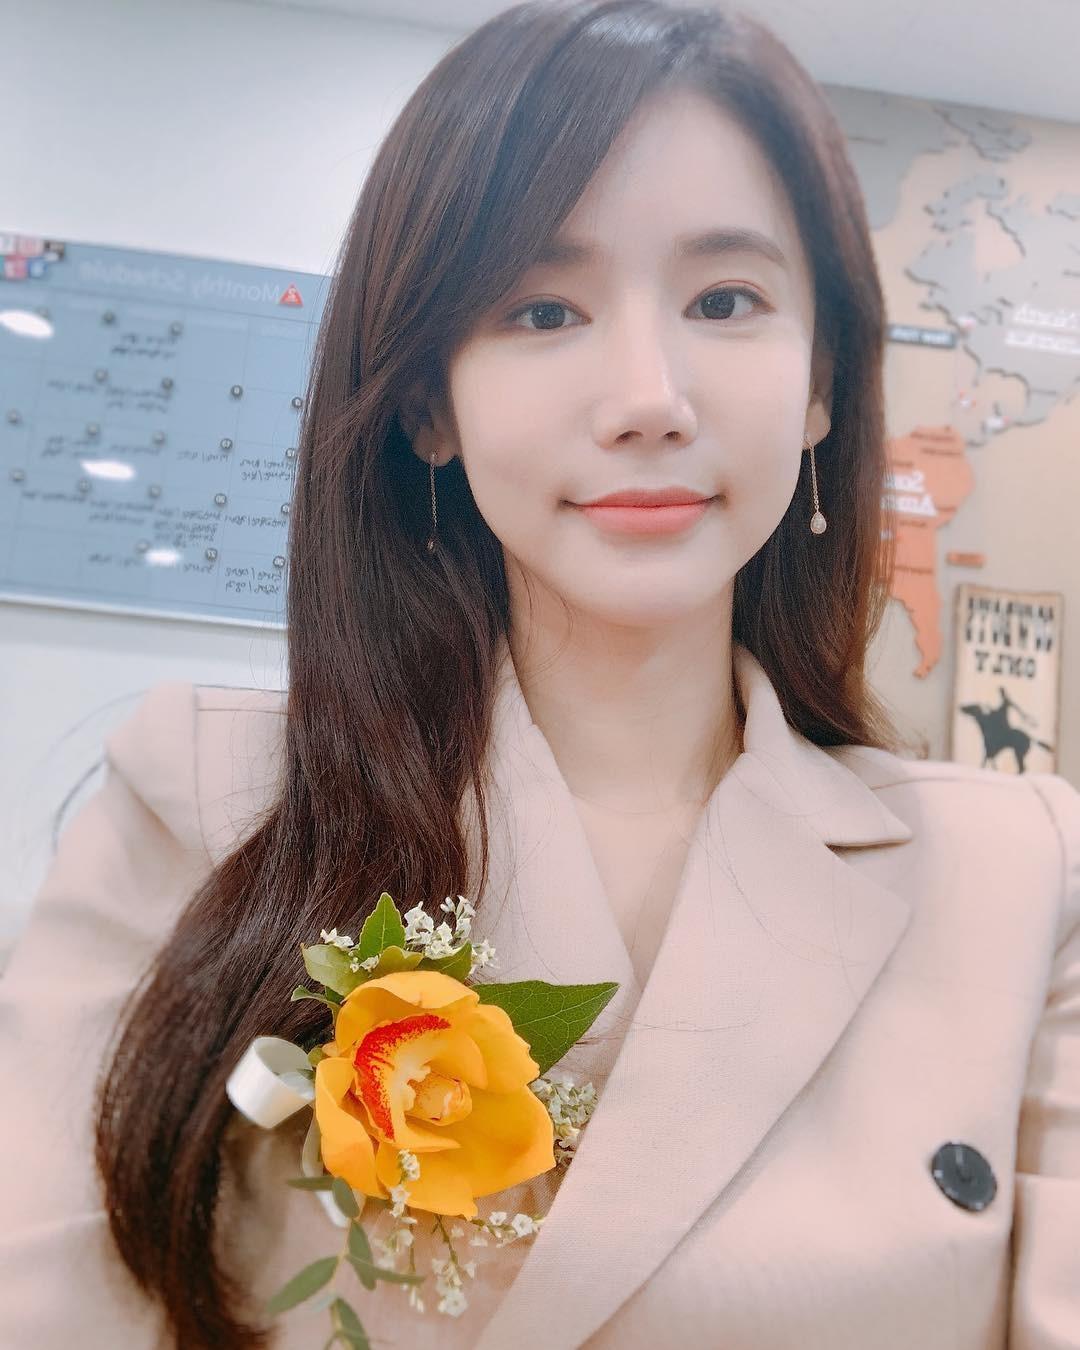 A atriz sul-coreana Oh In Hye (Foto: Reprodução Instagram)